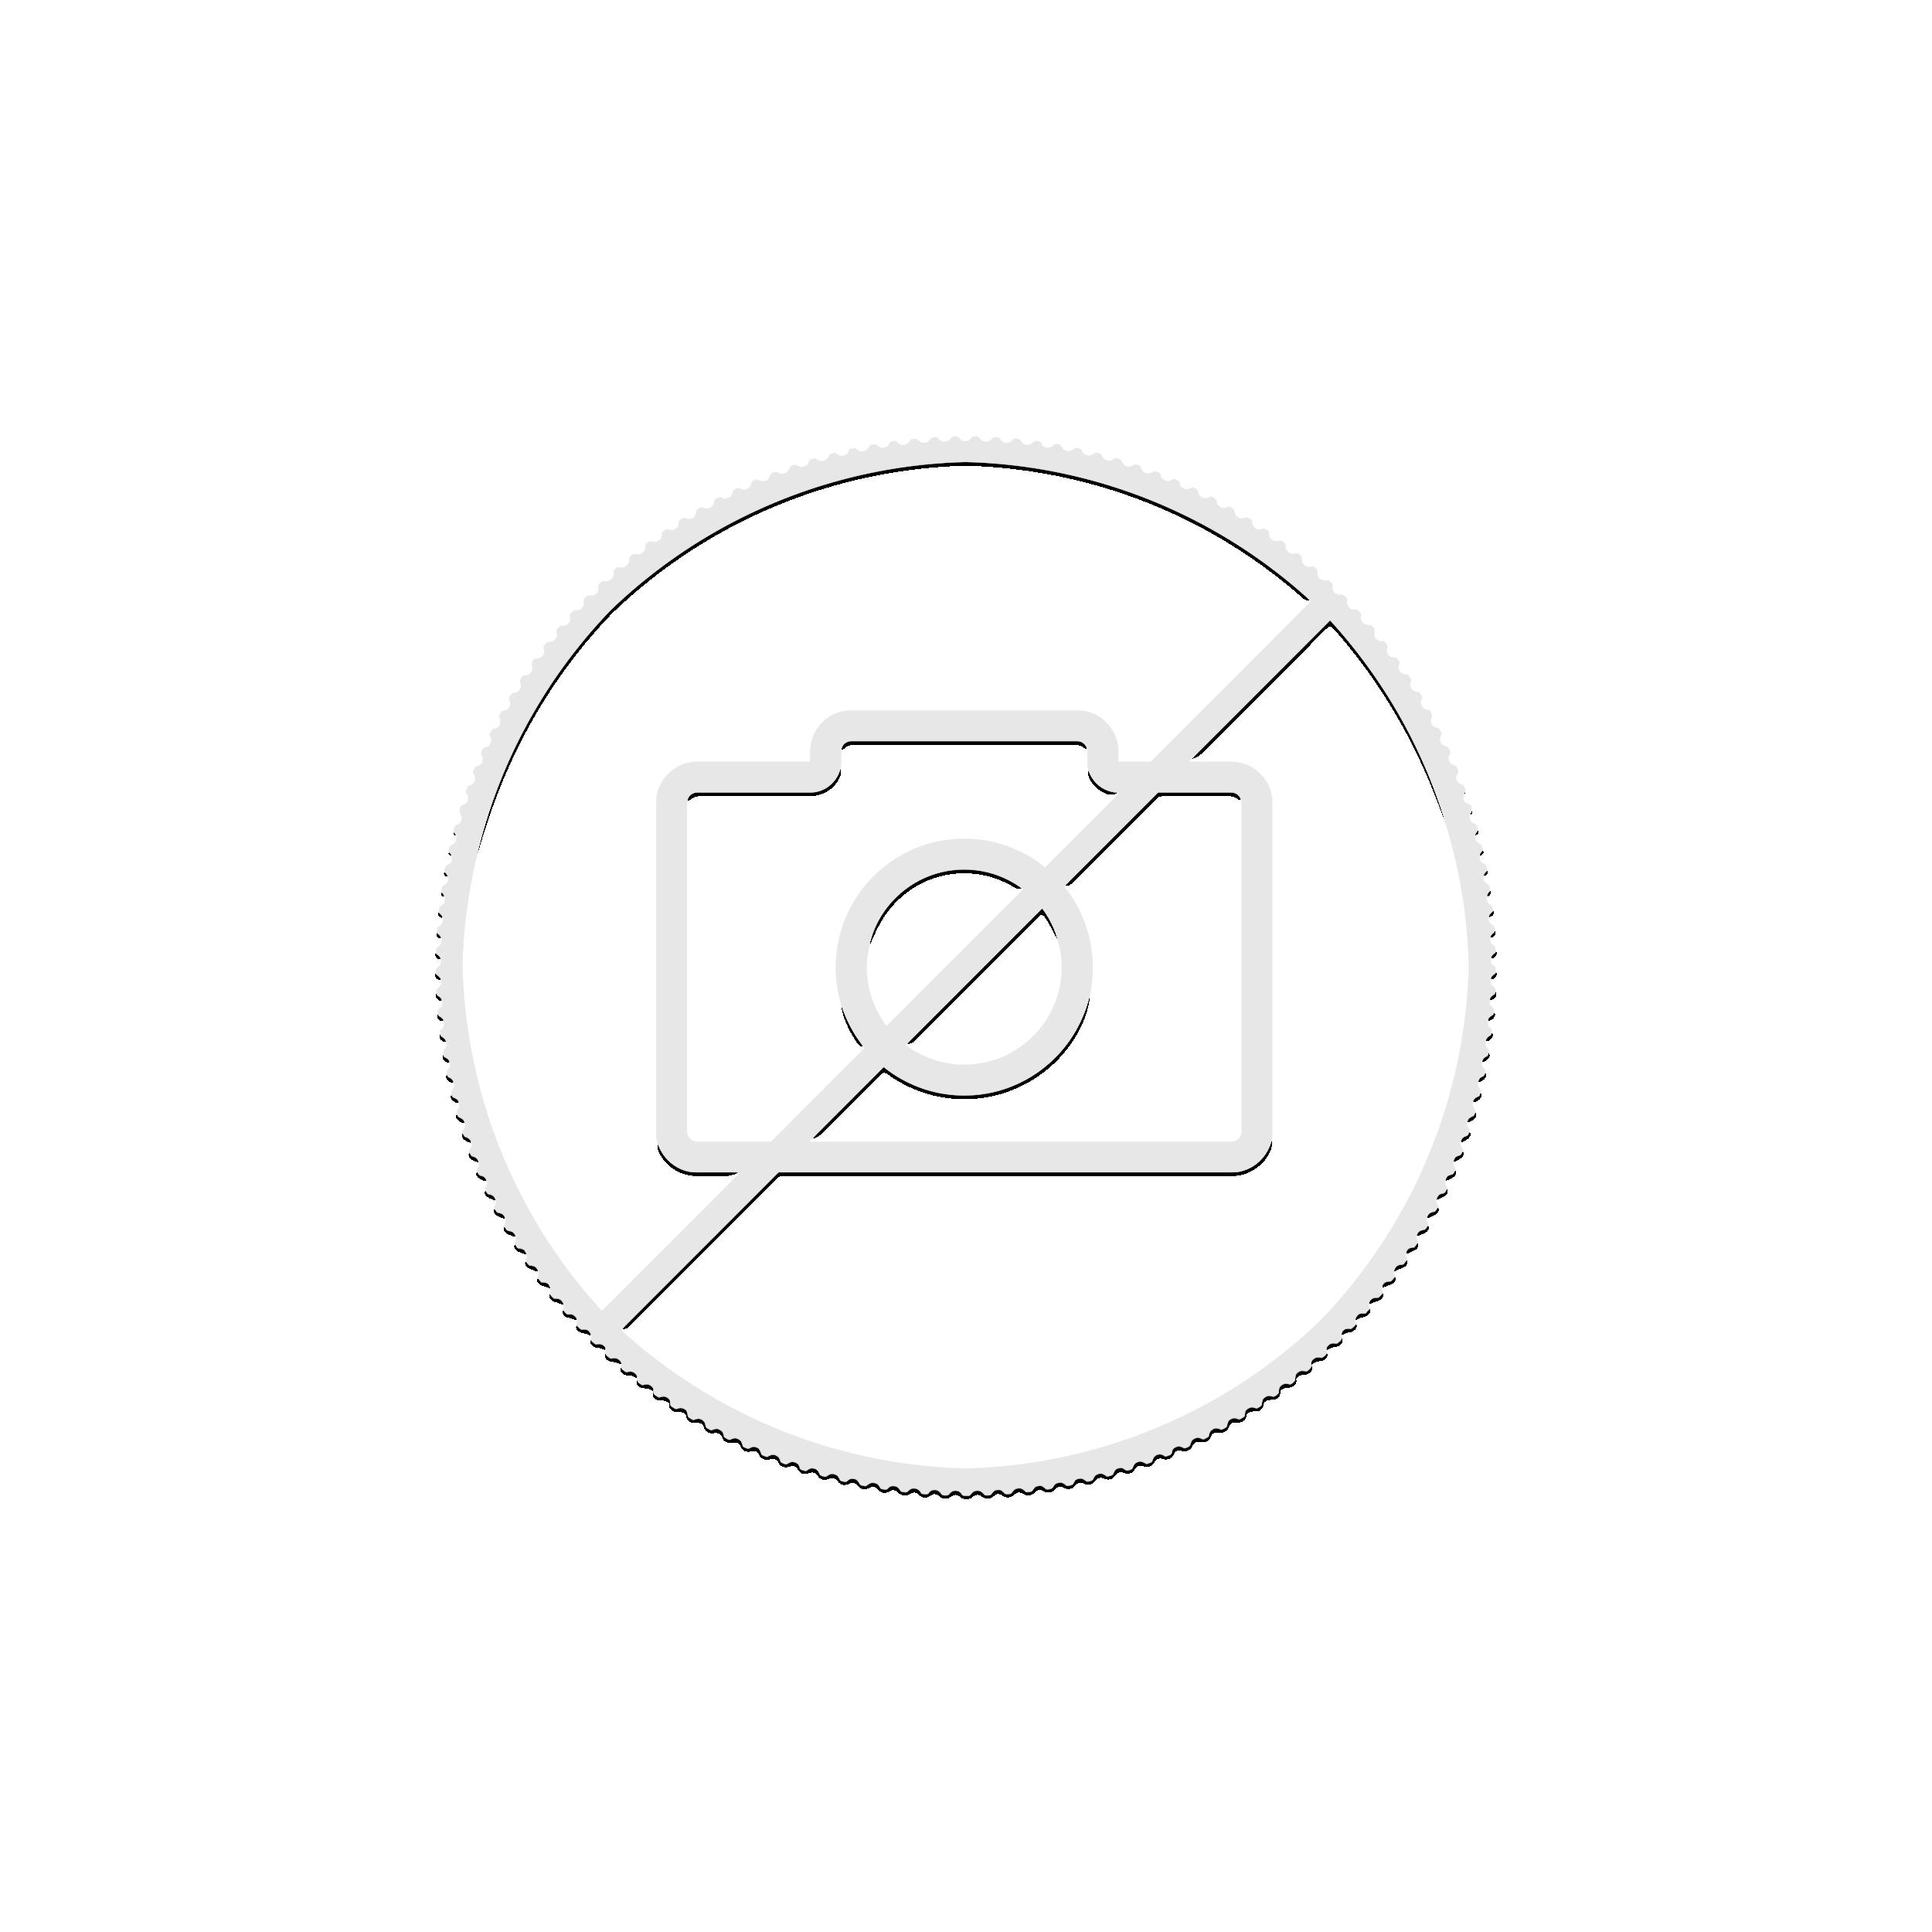 15 Gram gold Panda coin 2020